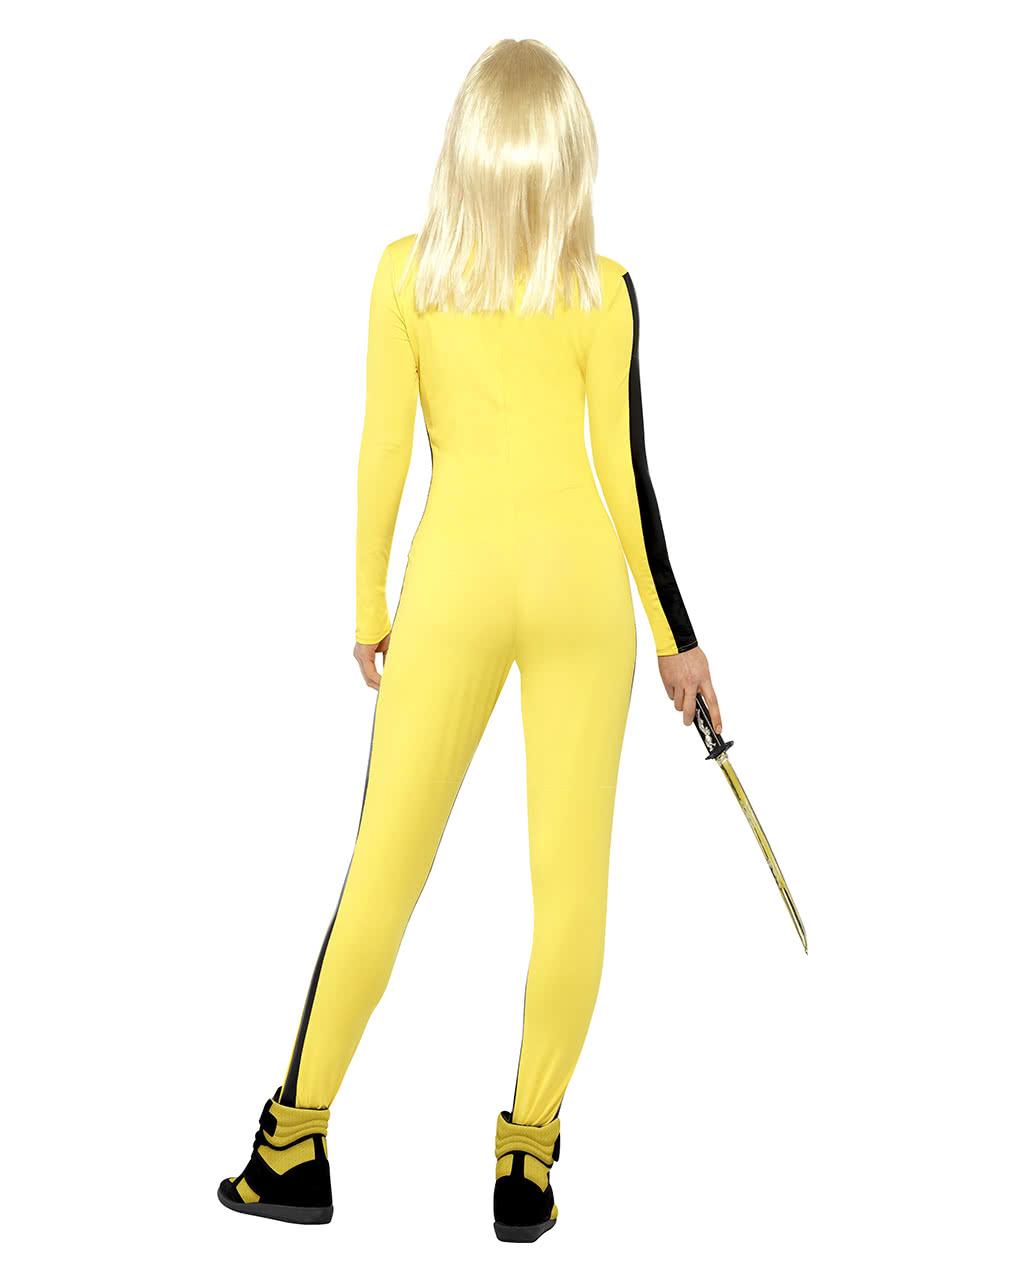 kill bill ladies costume licensed kill bill jumpsuit horror. Black Bedroom Furniture Sets. Home Design Ideas